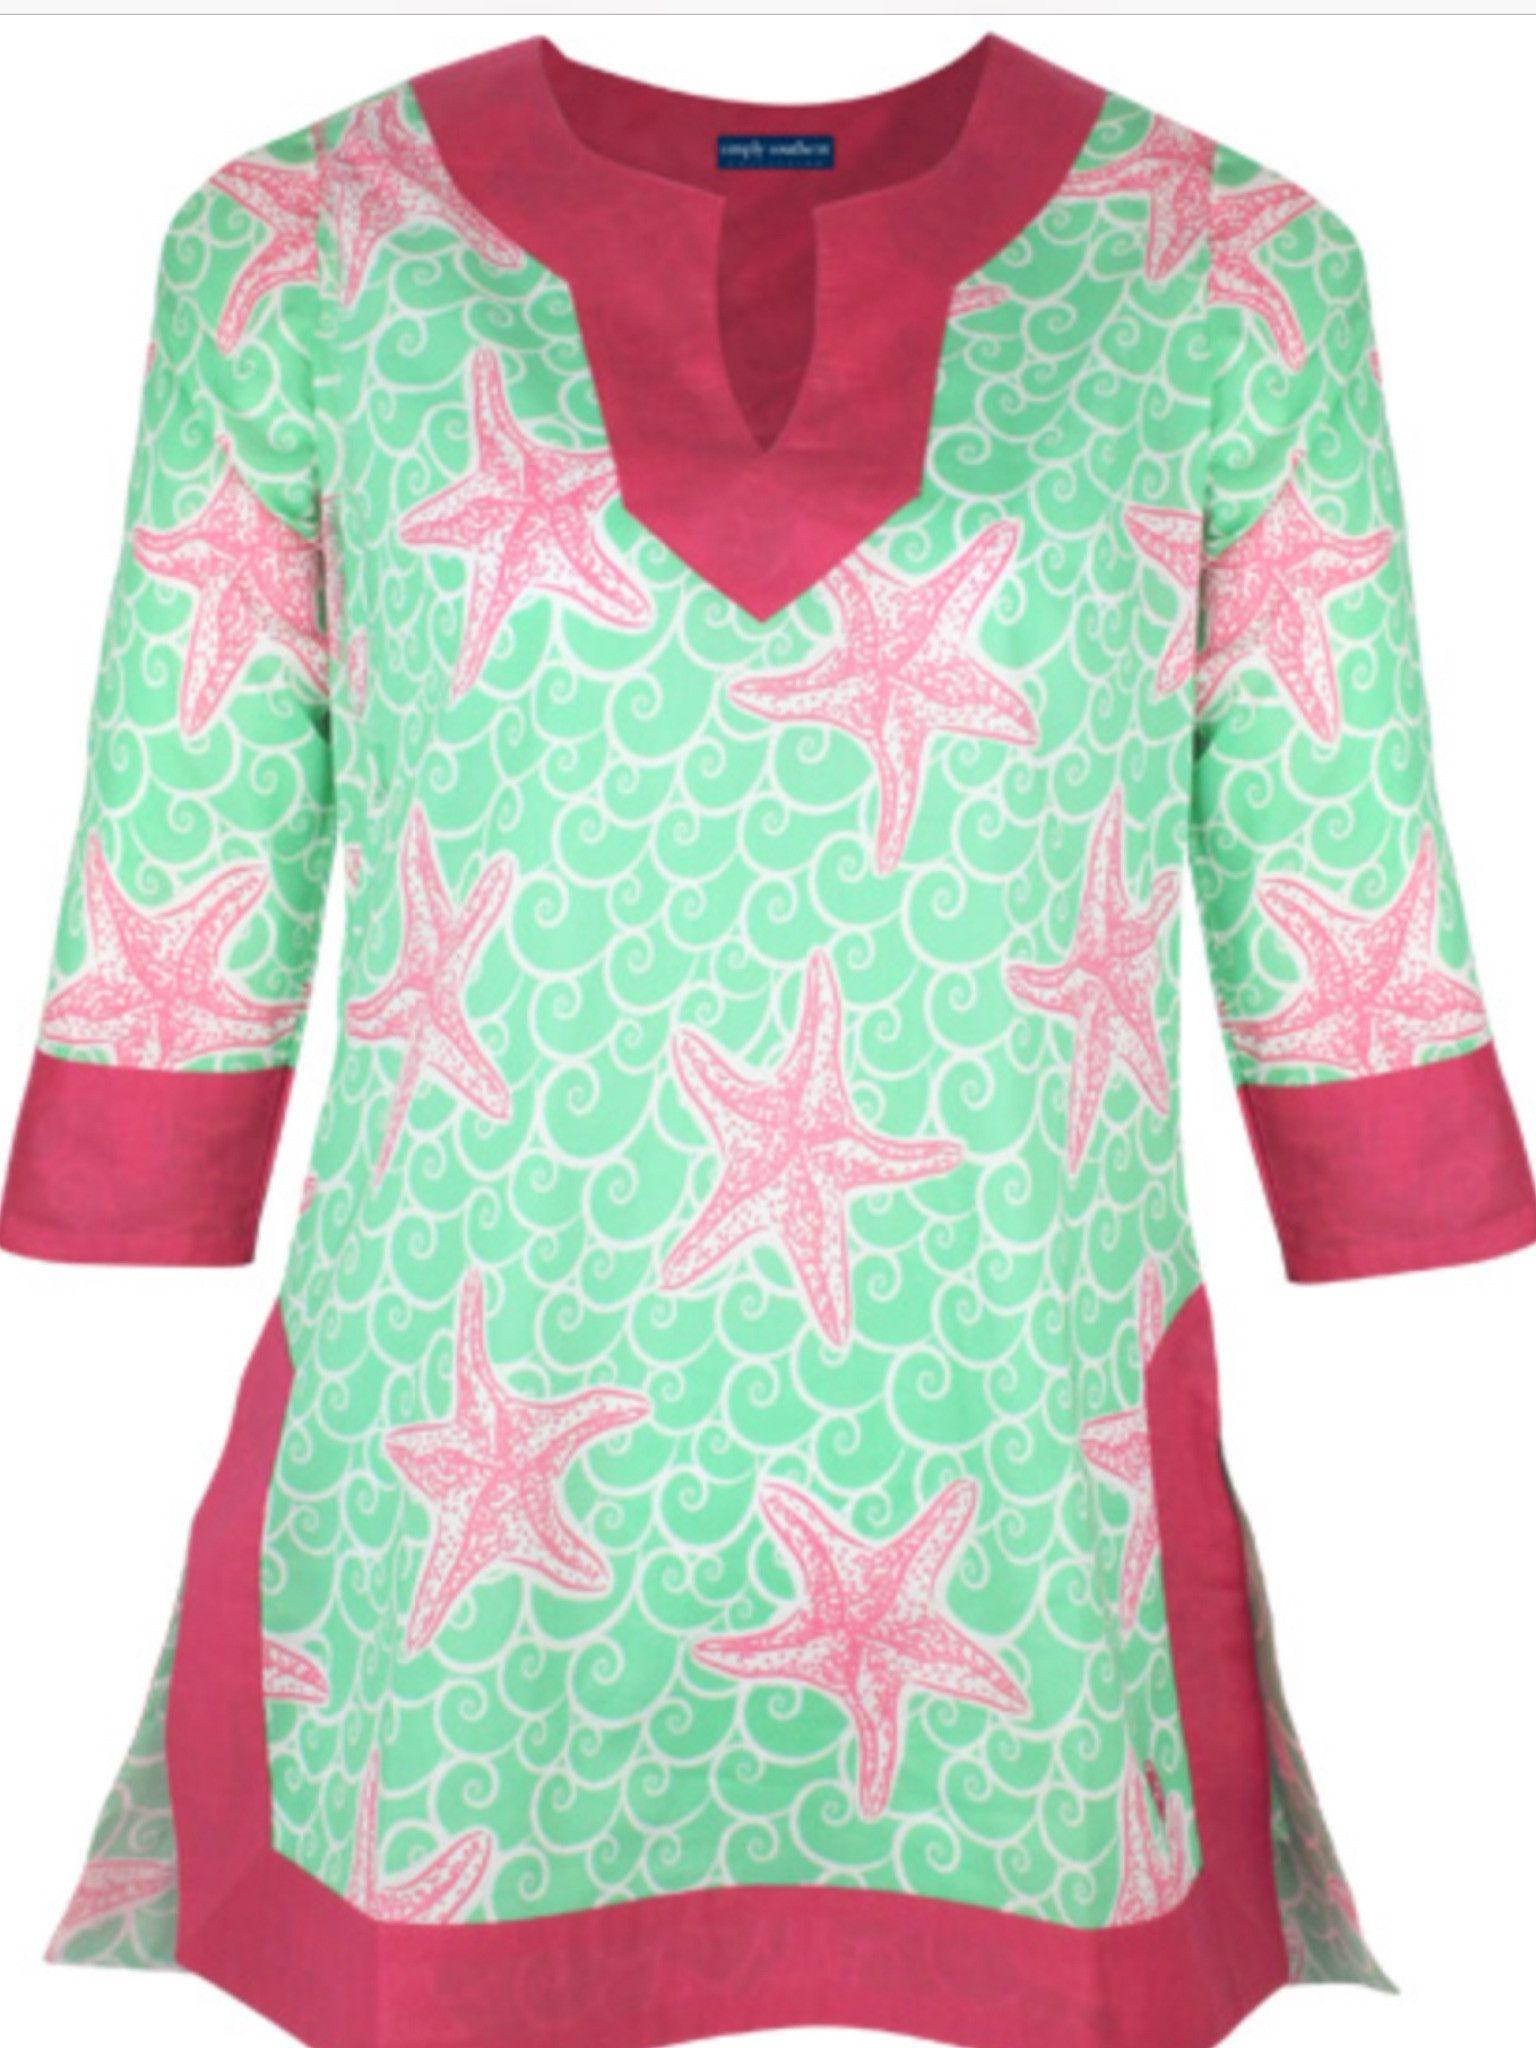 03ce89a61f5 Simply Southern Tunic Star | shirts | Tunic tops, Cotton tunics, Tunic